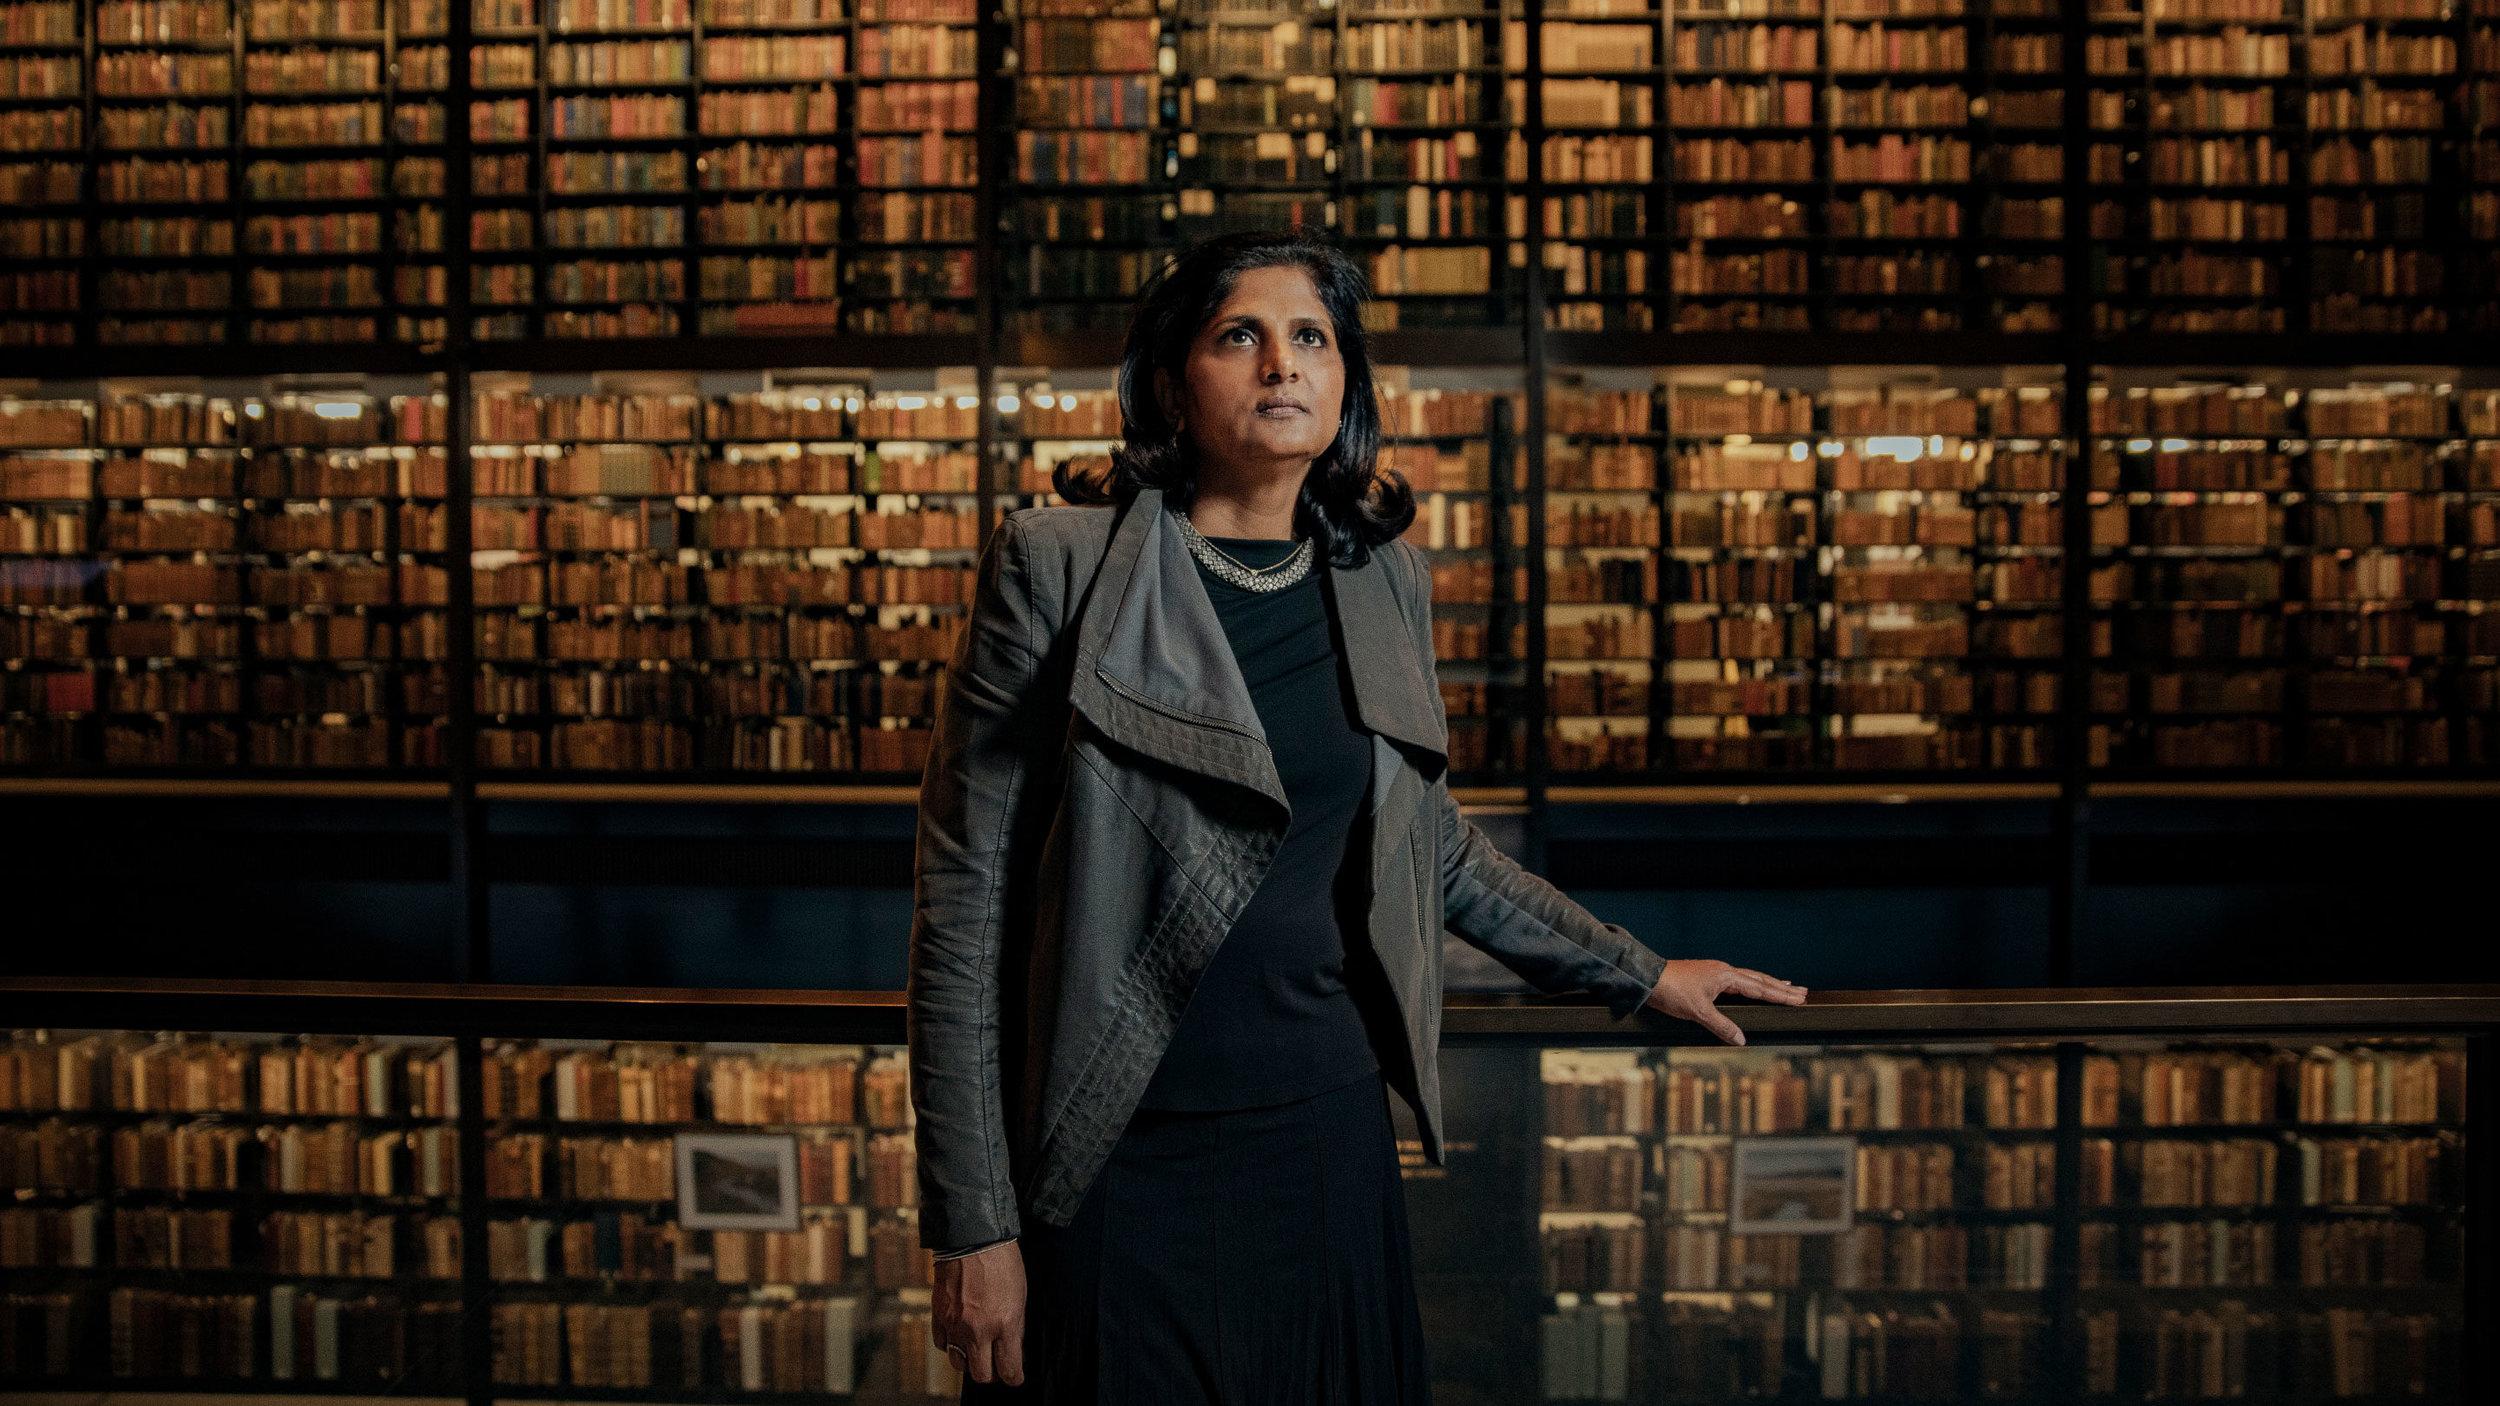 Priyamvada Natarajan - Yale University Professor And Theoretical Astrophysicist for Quanta Magazine - LINK